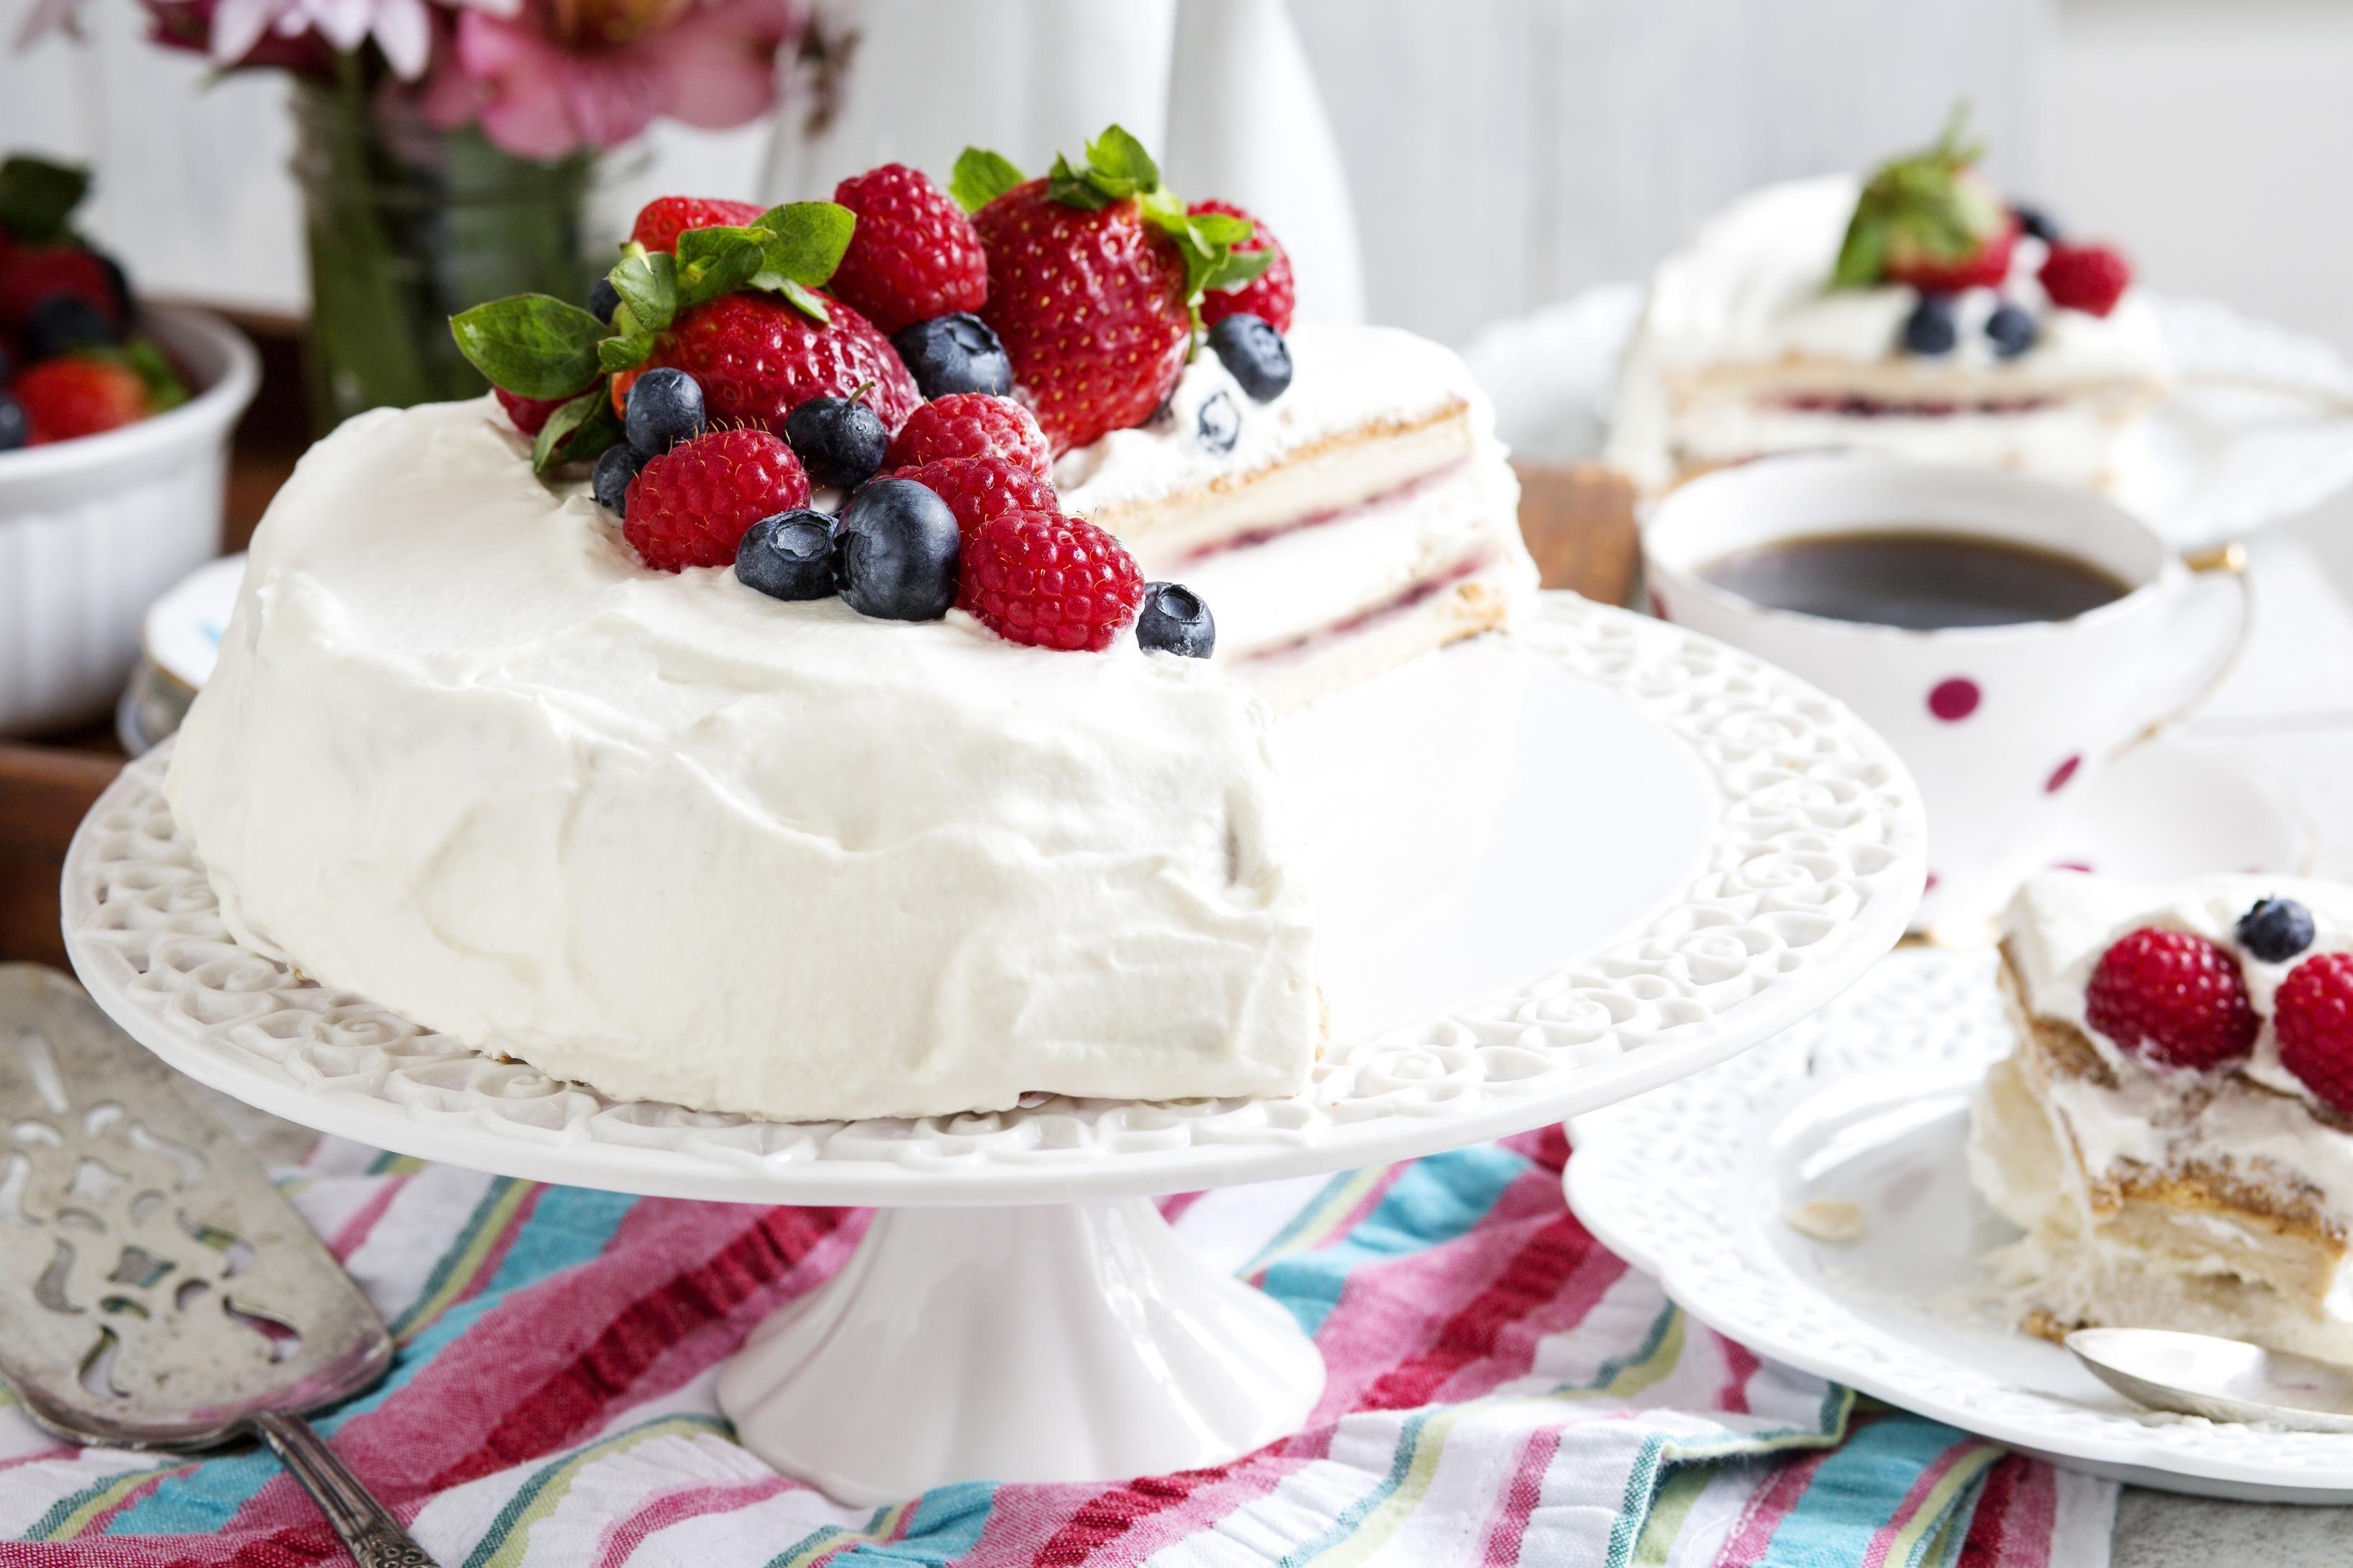 Glutenfree tuesday grandmas angel food cake just got